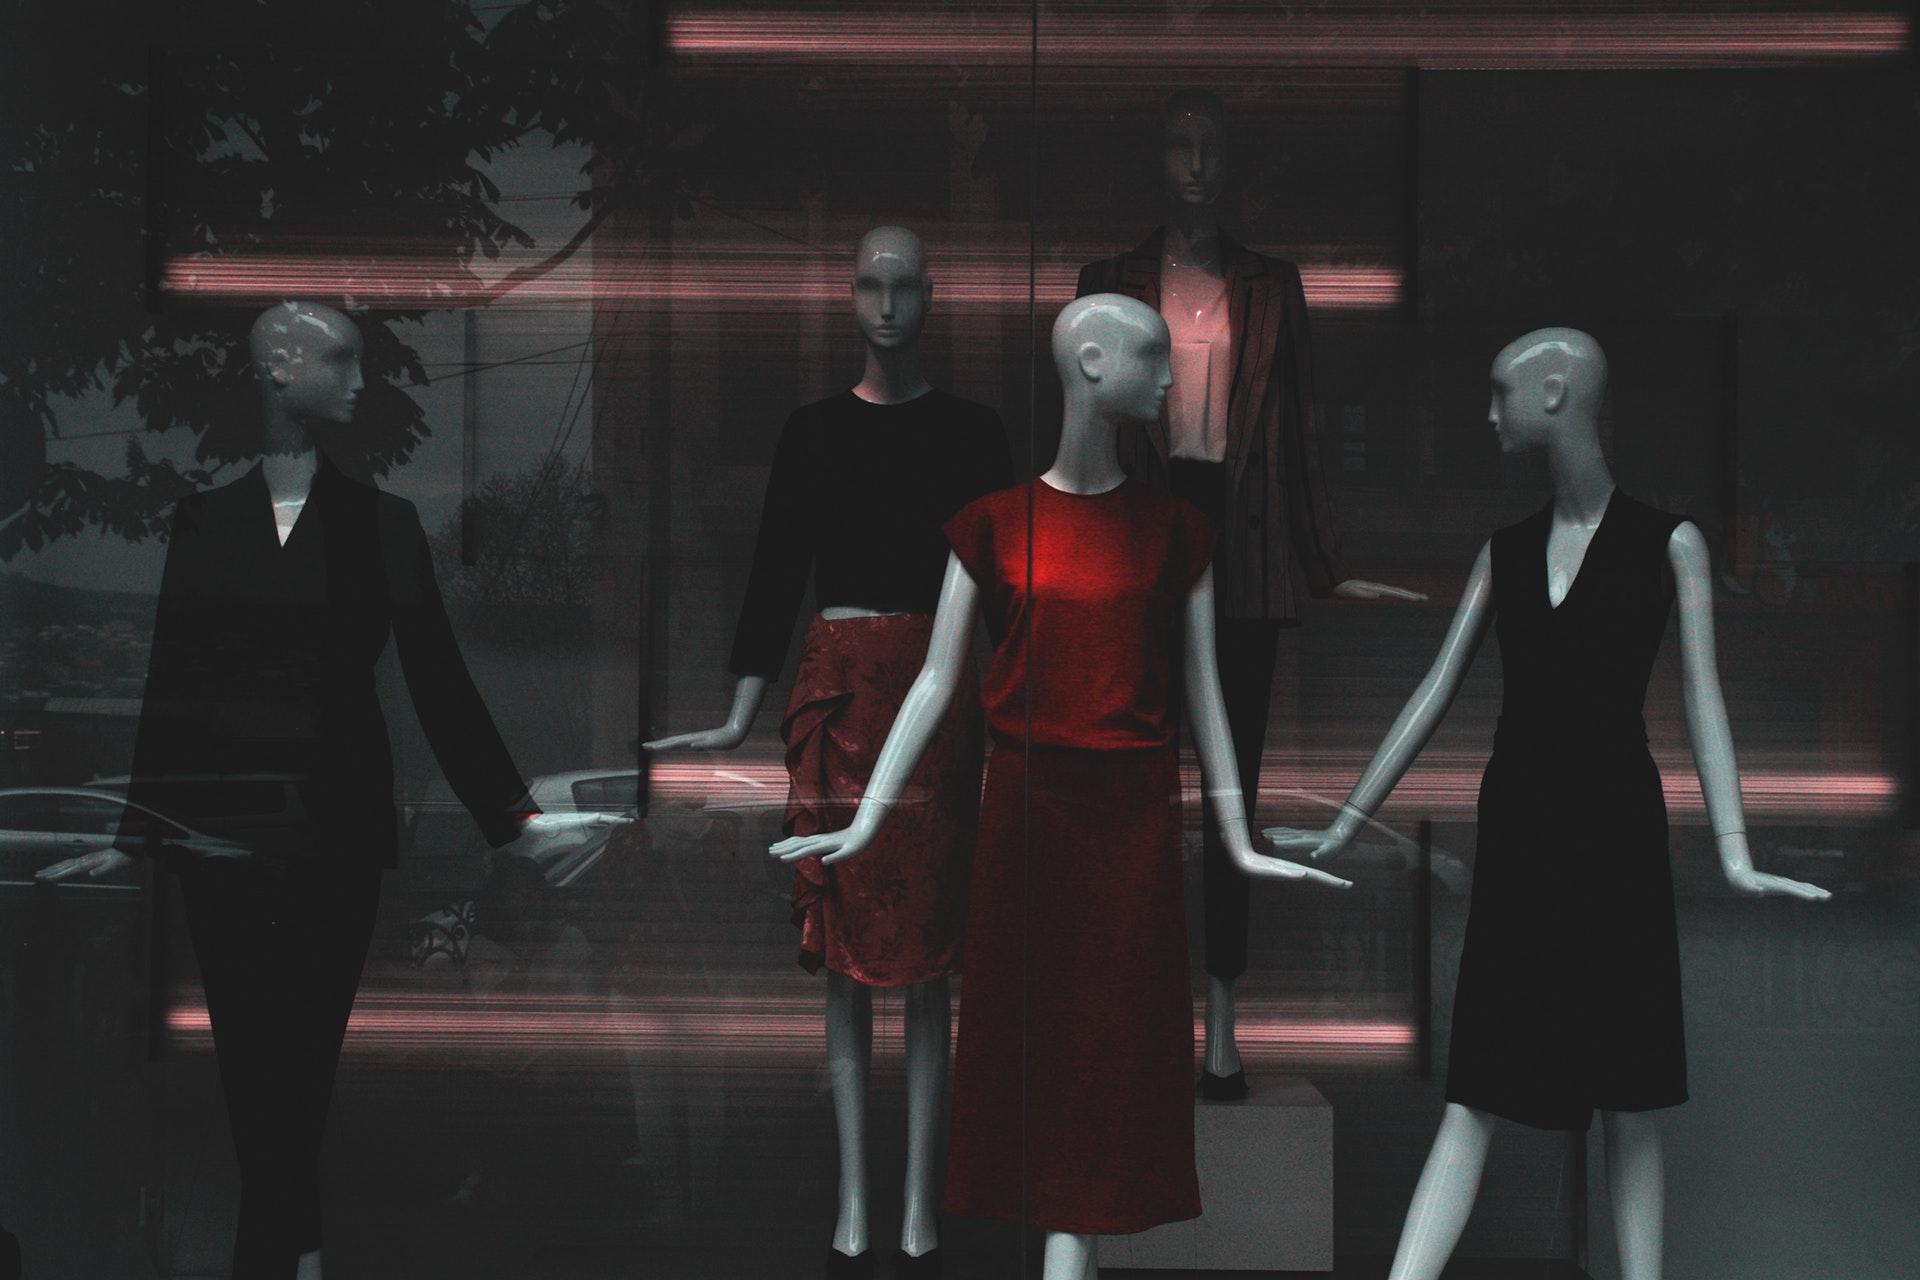 mannequins-1008206.jpg